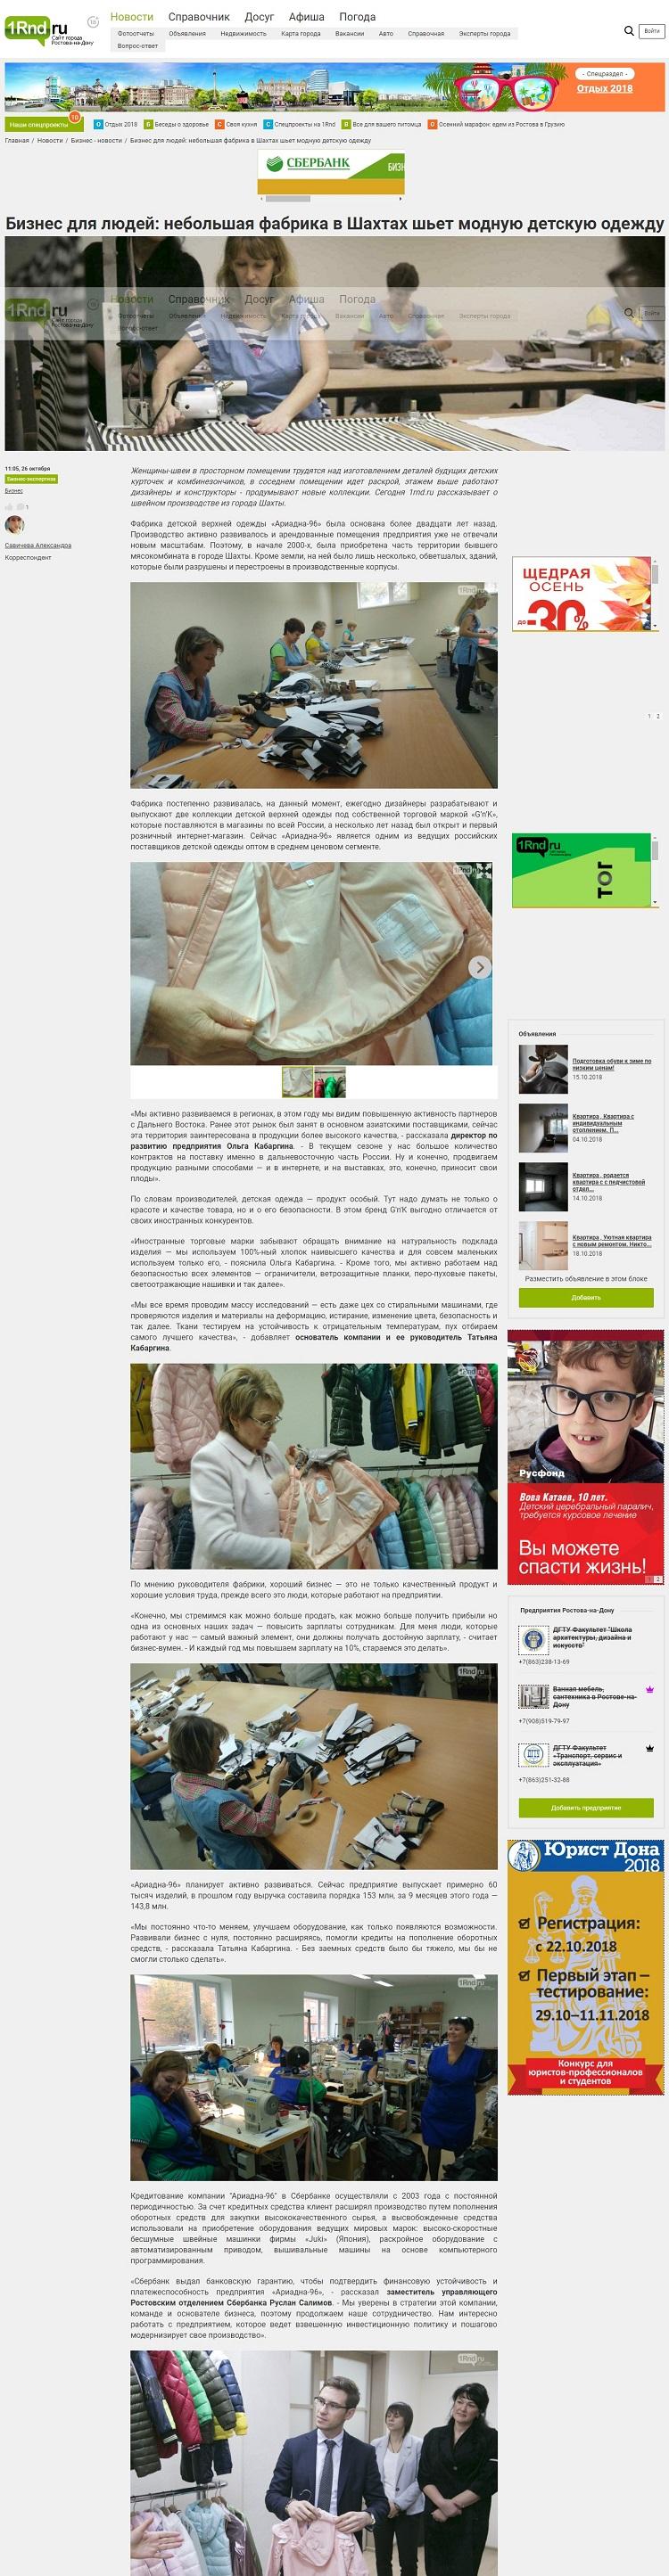 публикация в интернет журнале 1rnd